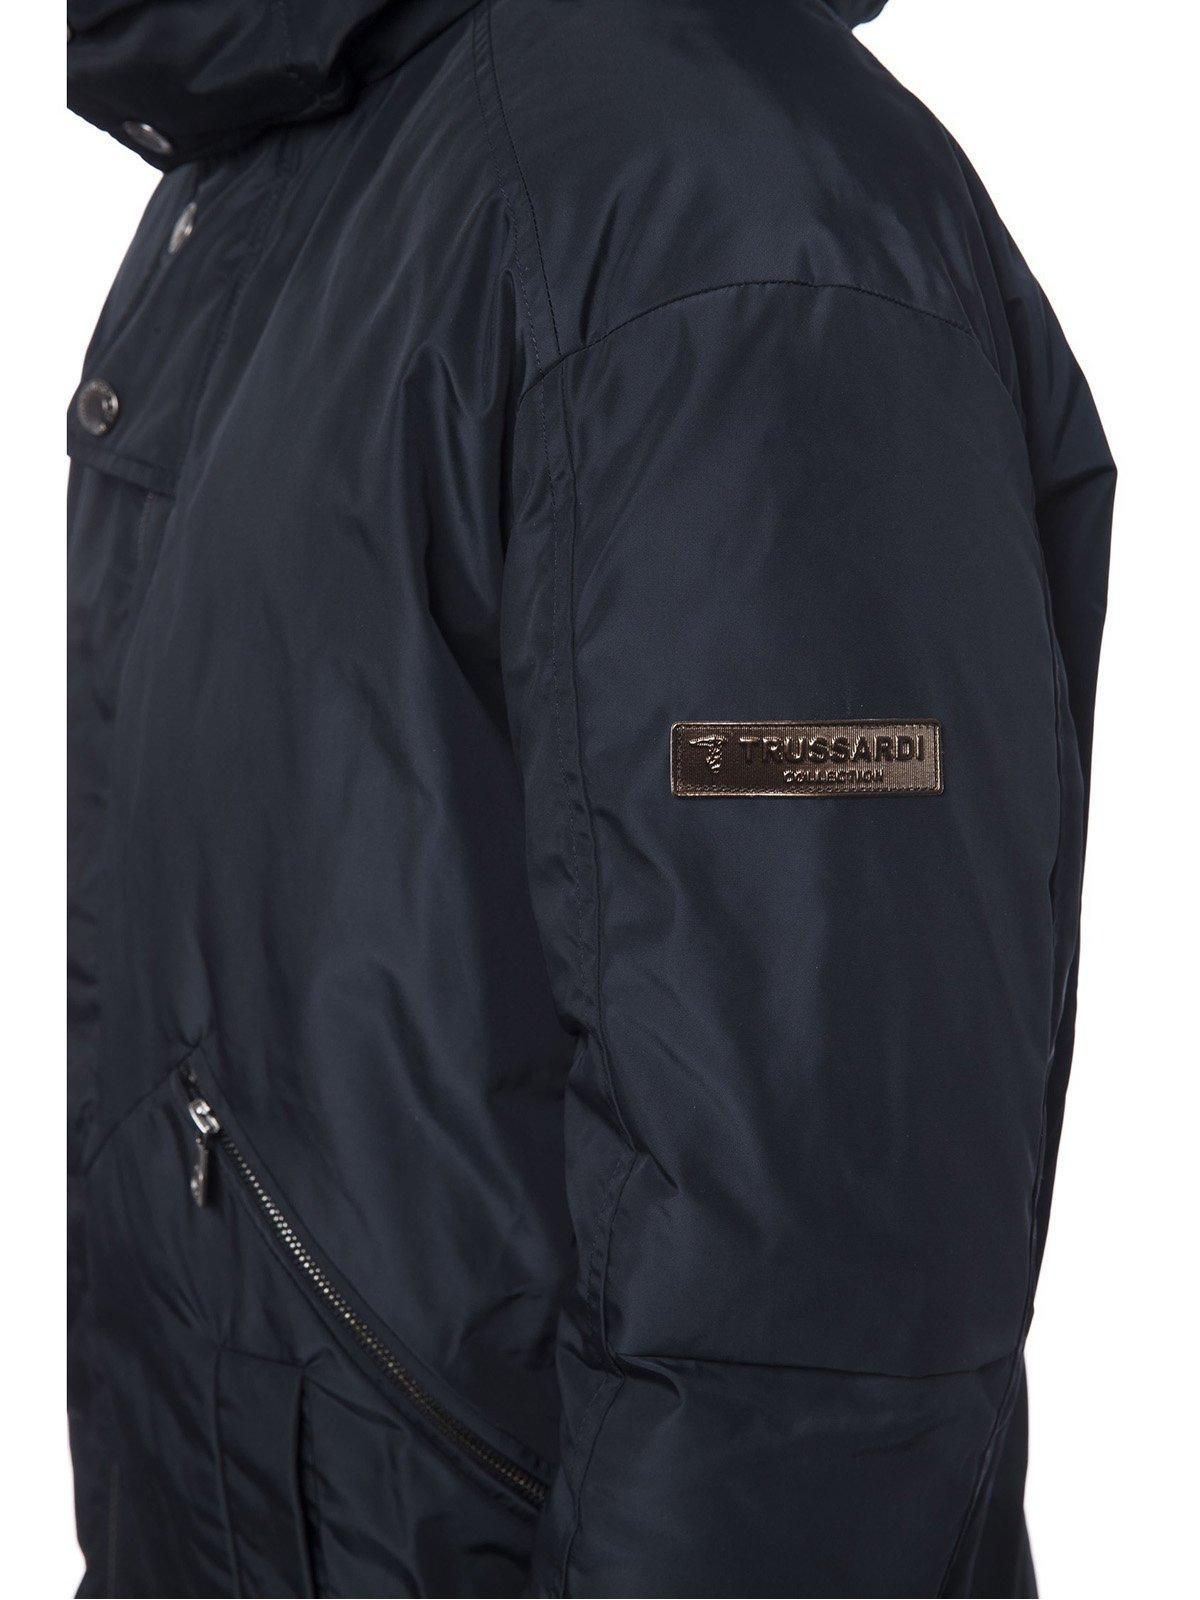 Куртка темно-синя | 3753369 | фото 3